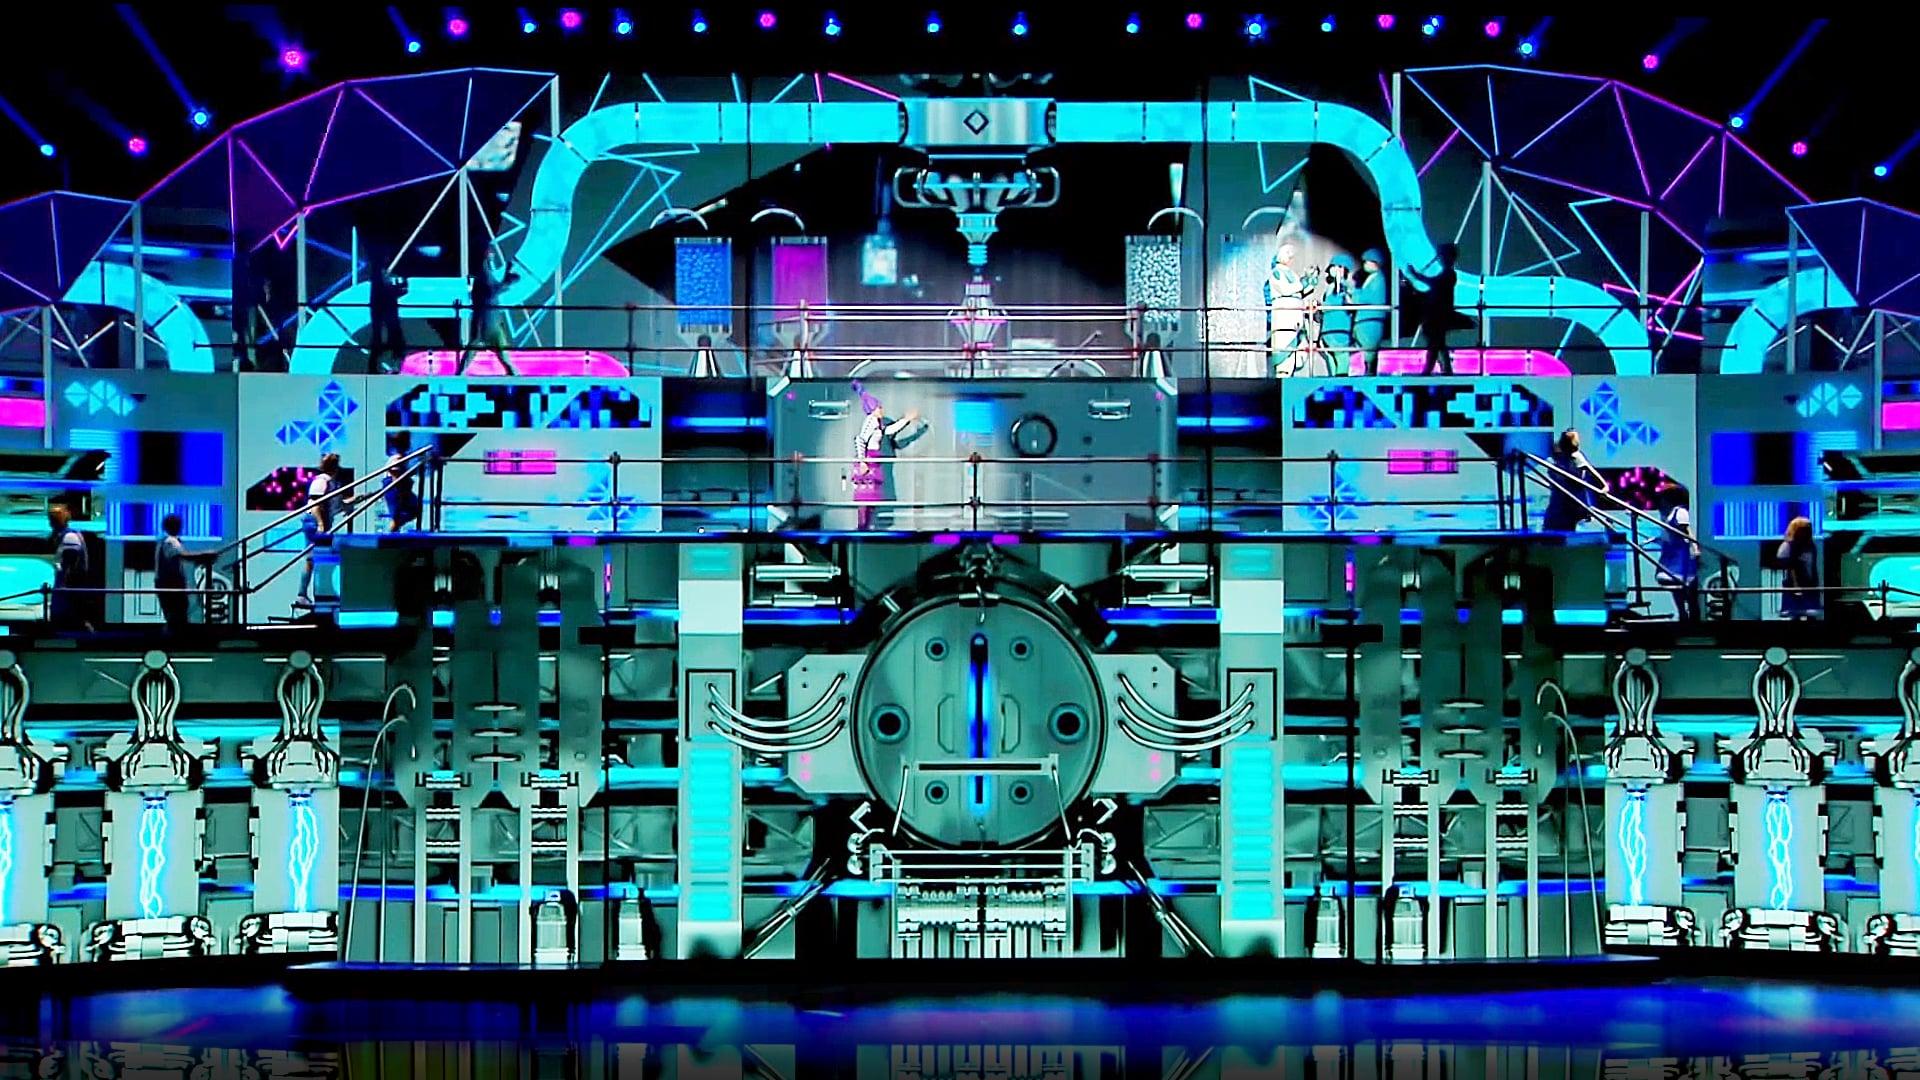 Álomutazó musical | stage set design & visuals